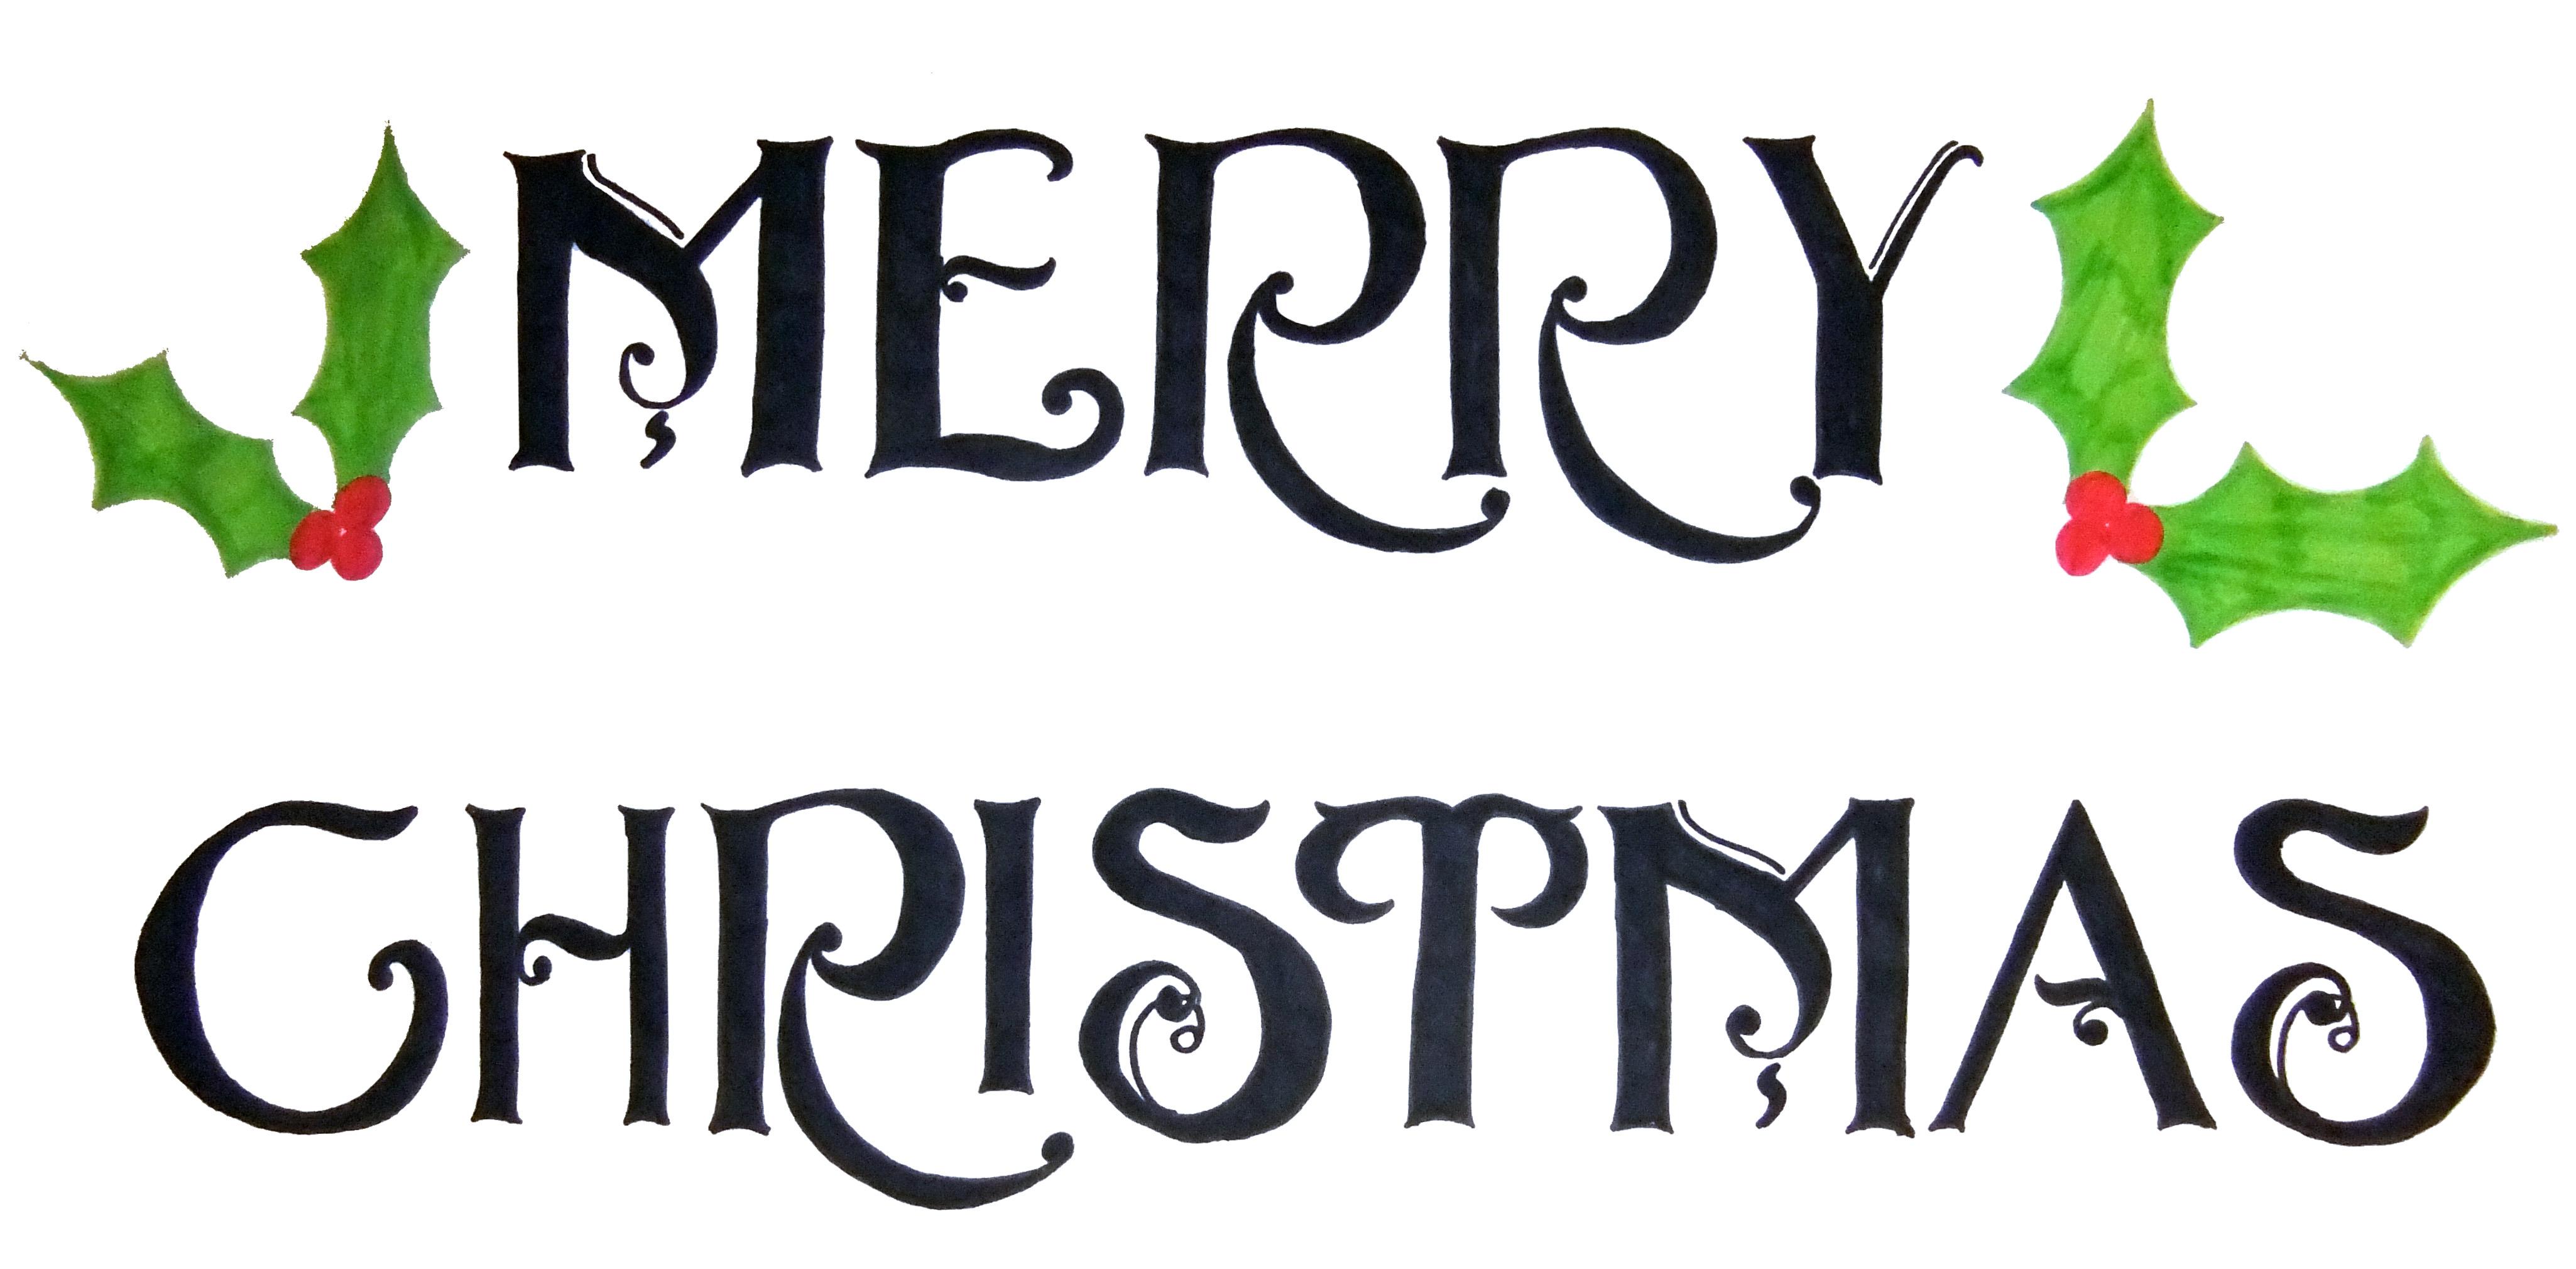 4100x2020 Merry Christmas Clipart Merry Xmas